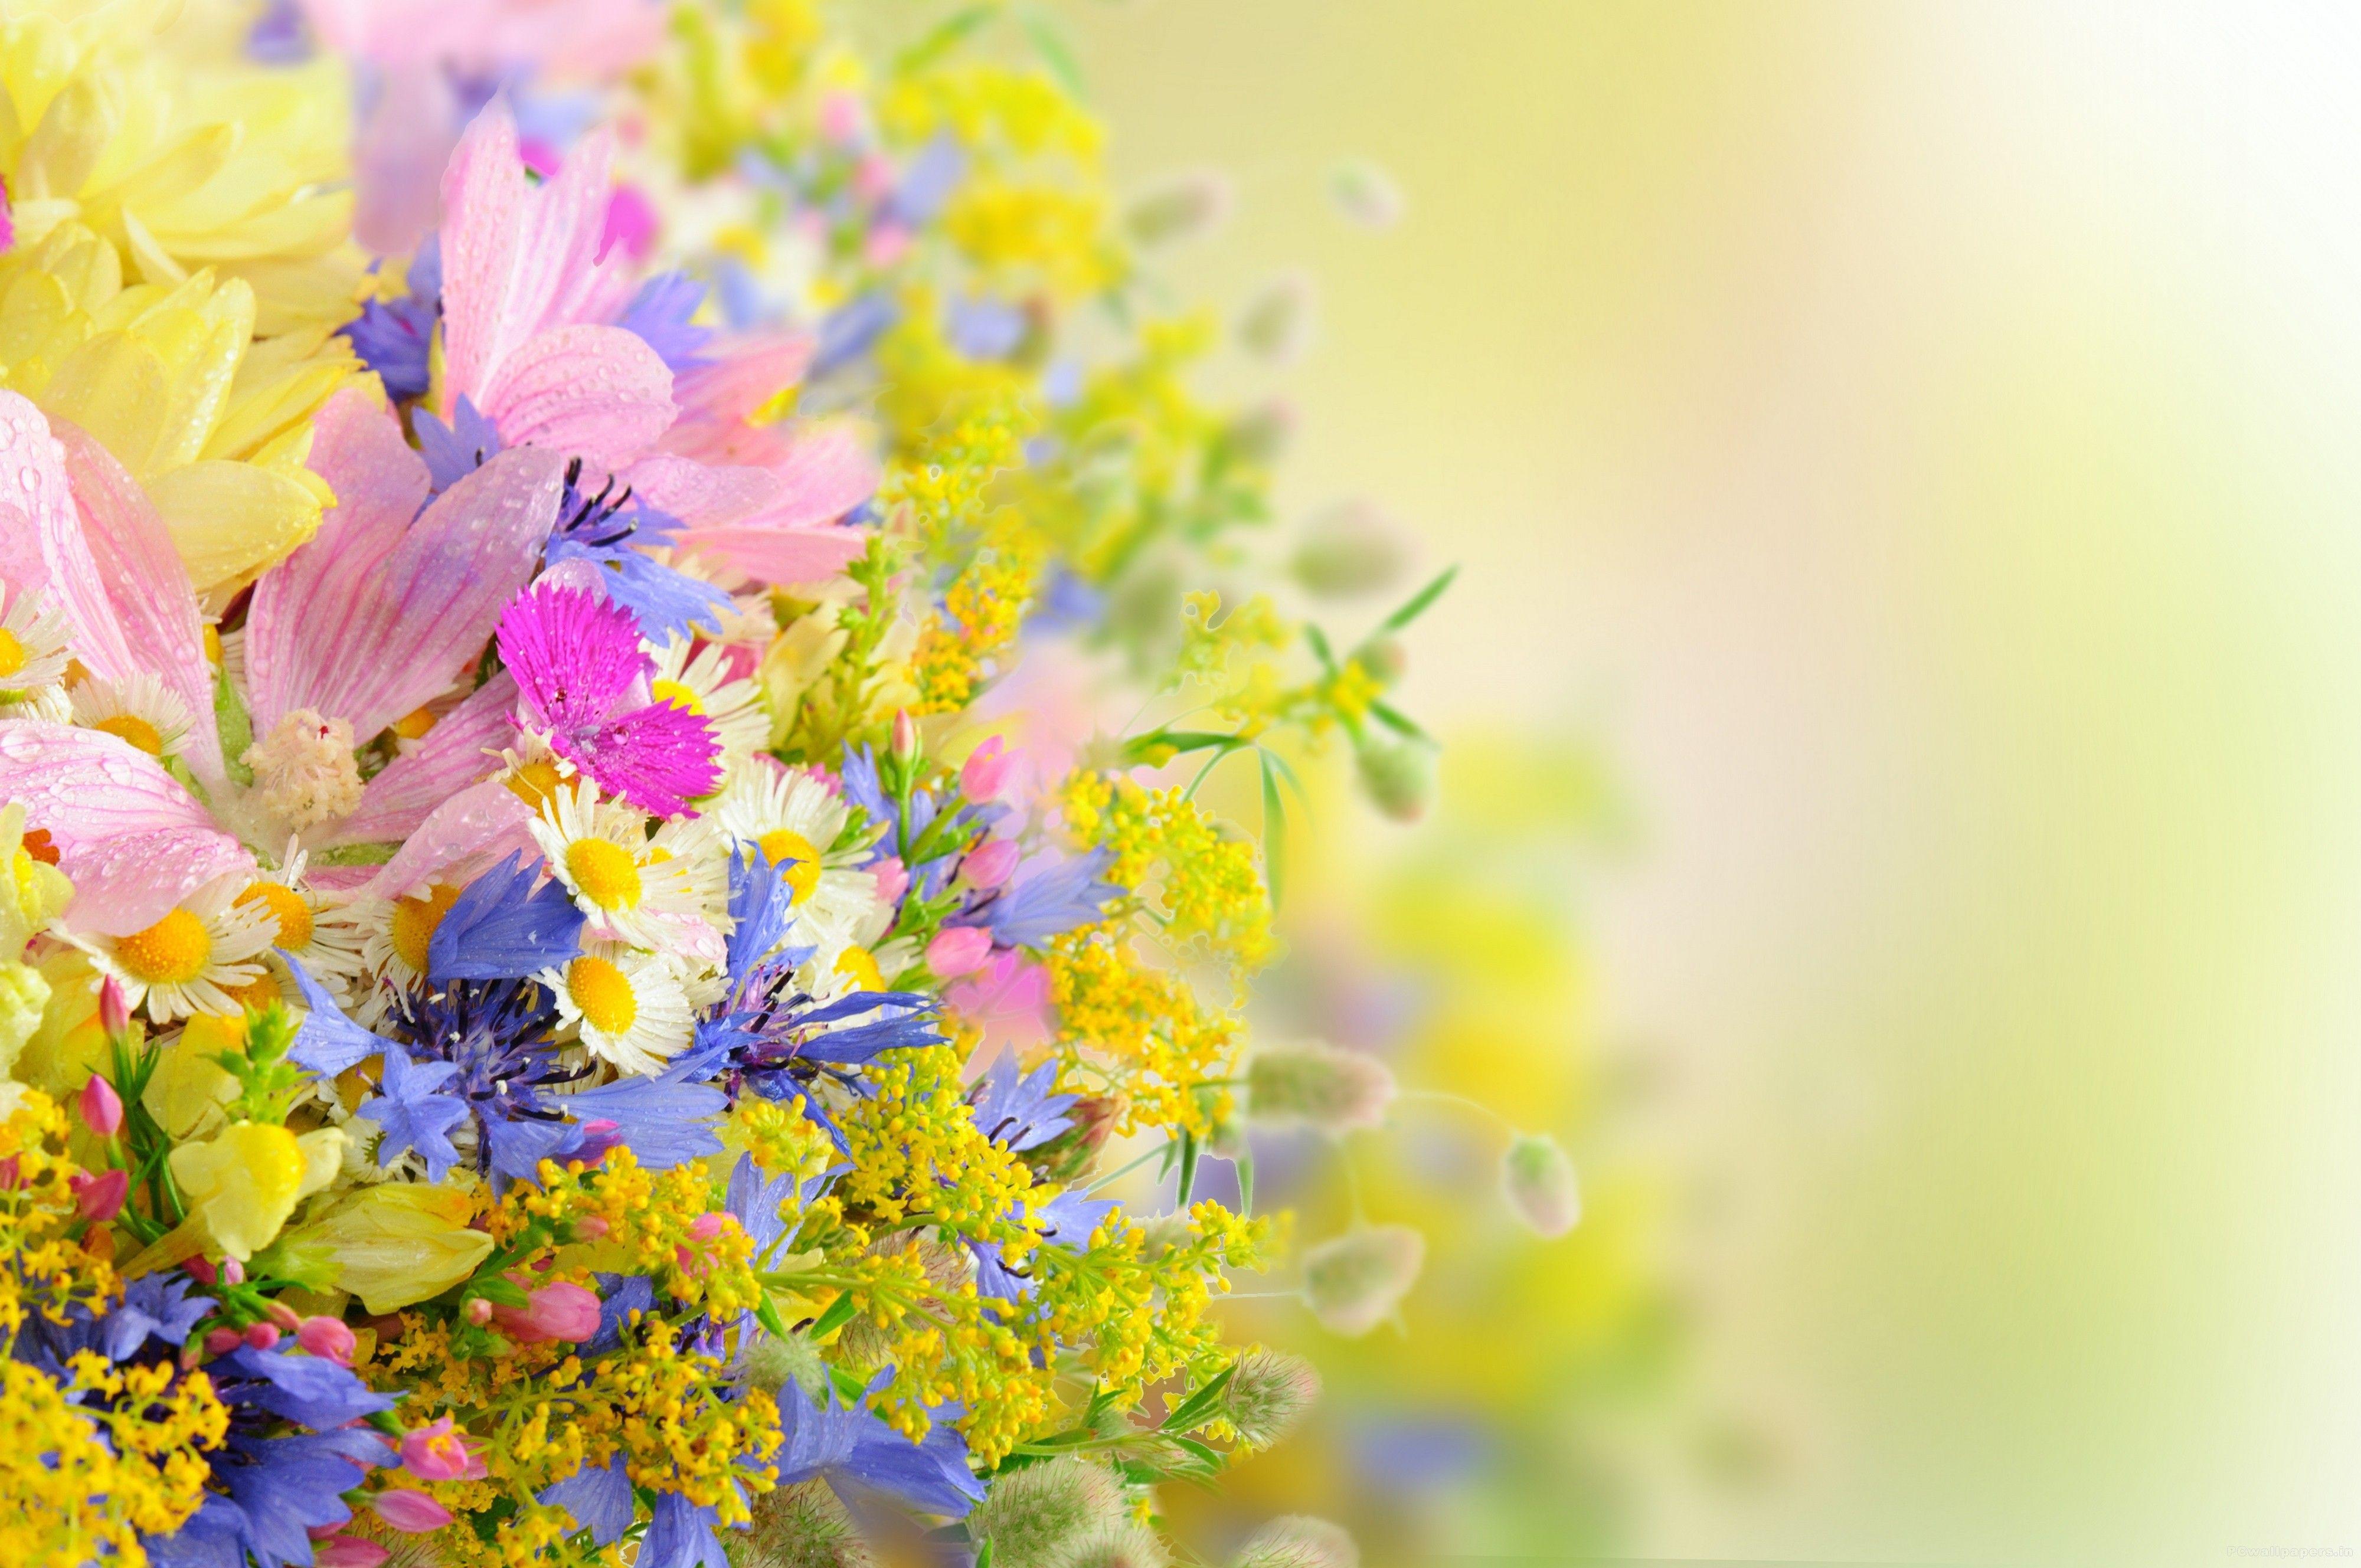 Flower Wallpaper Full Hd For Desktop Wallpaper 4000 x 2657 px 3.12 MB beautiful red blue ...